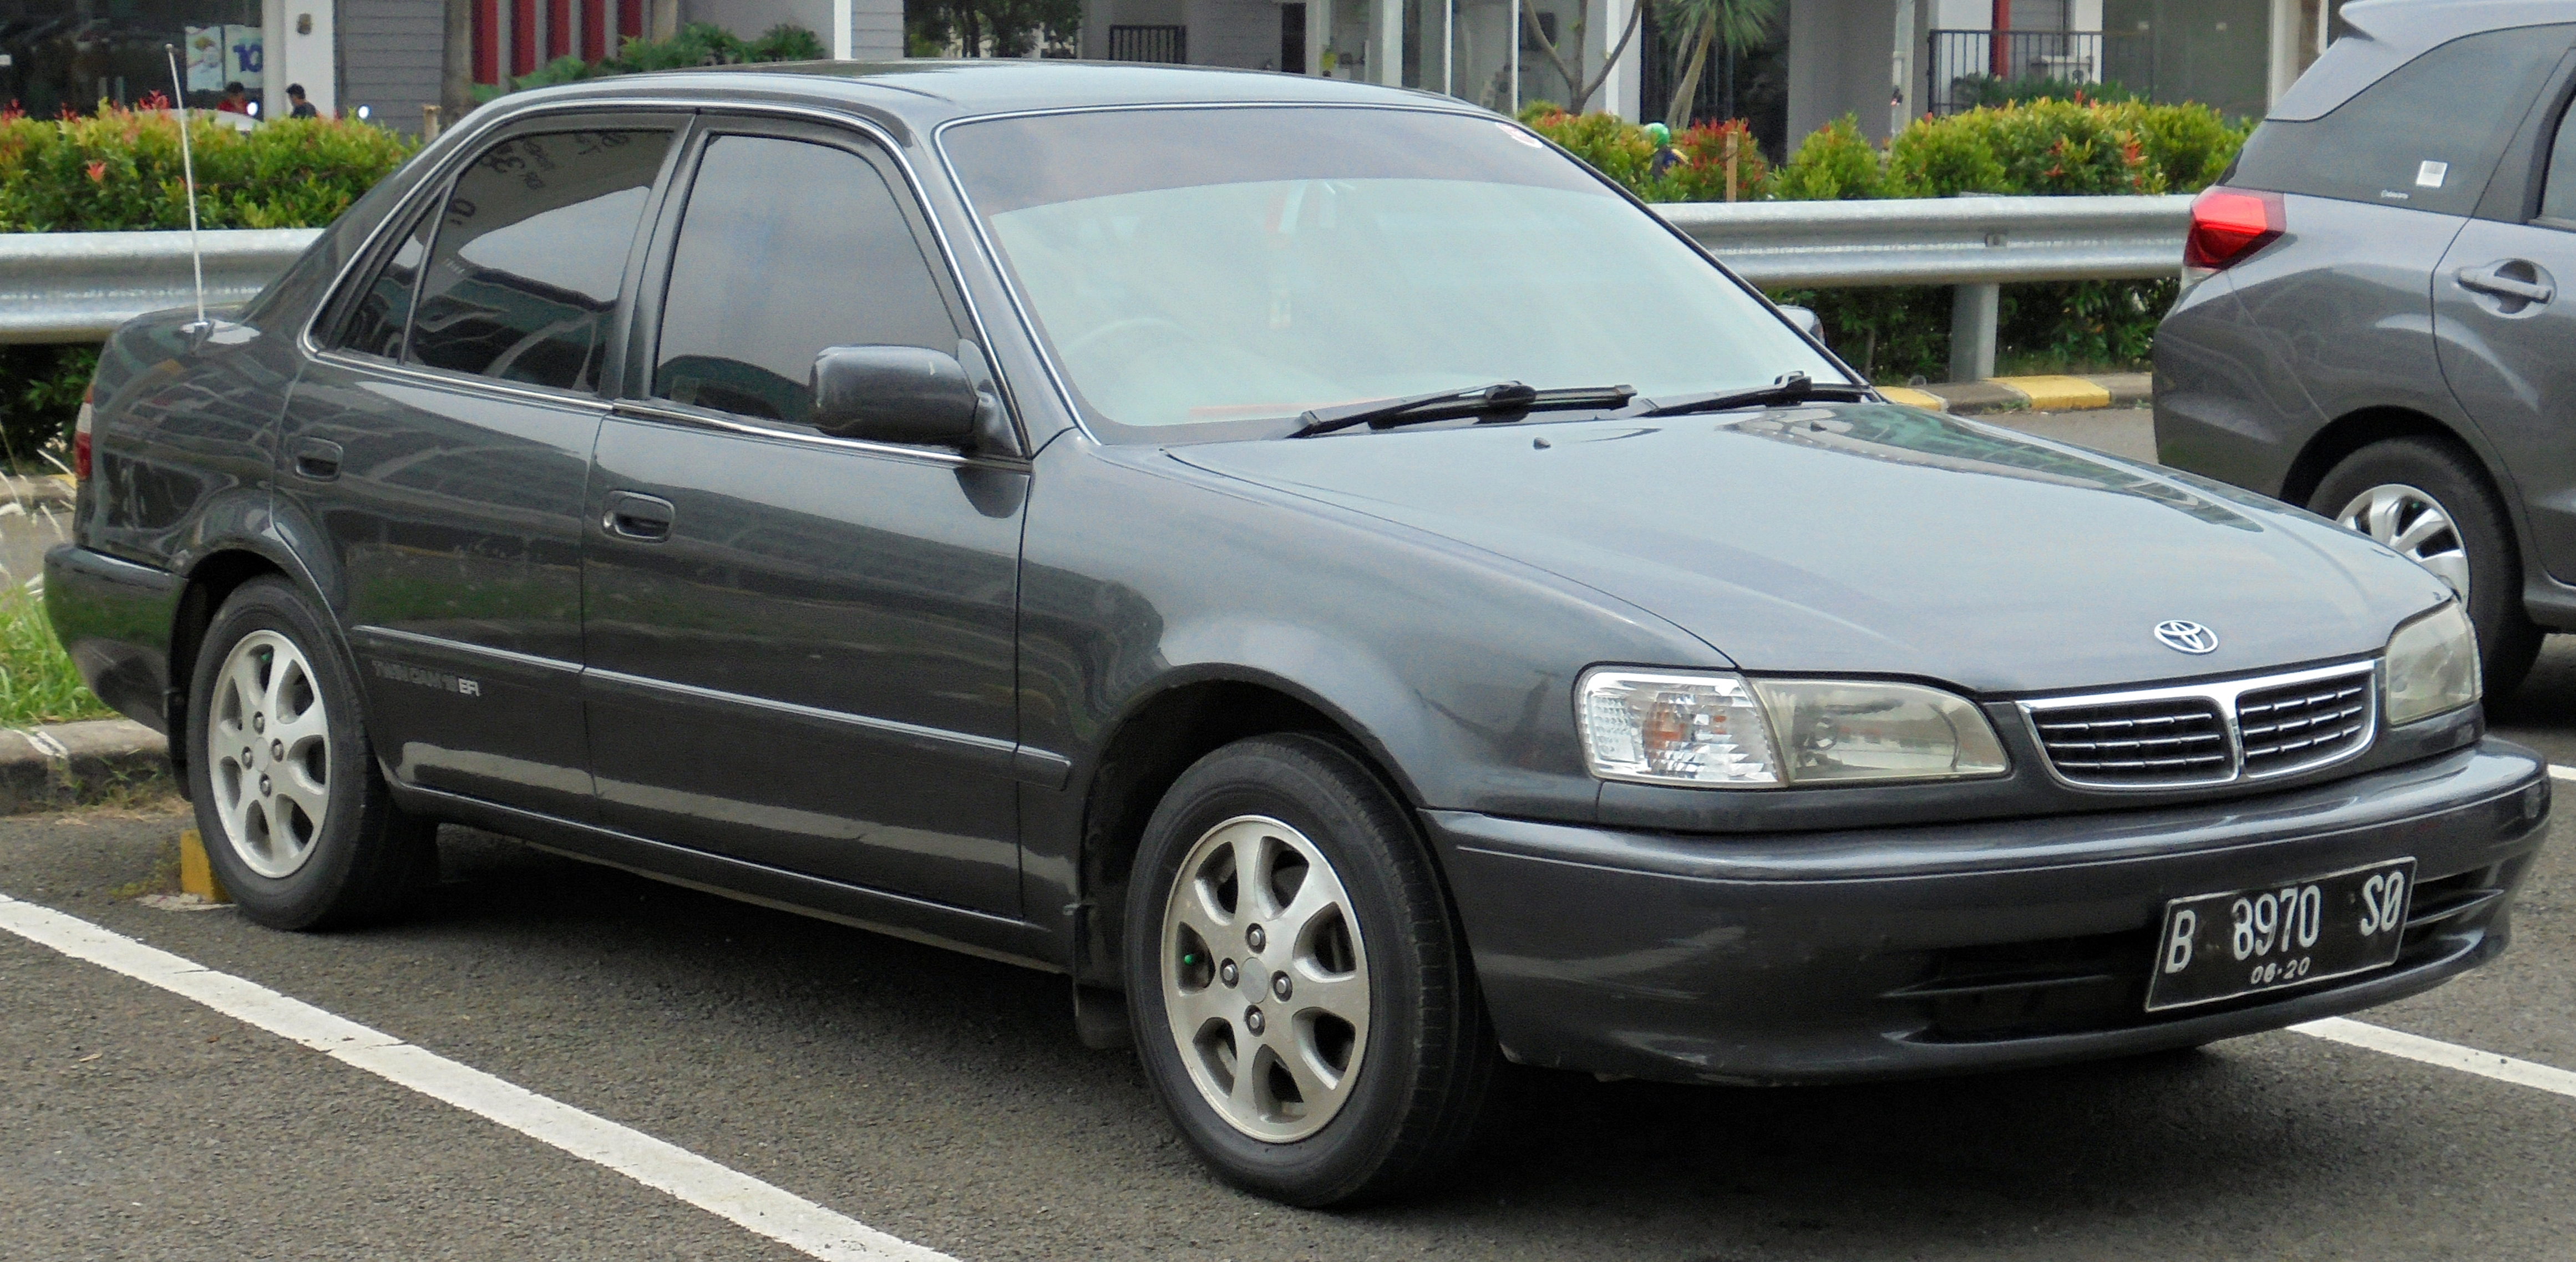 Kelebihan Corolla 1.8 Review